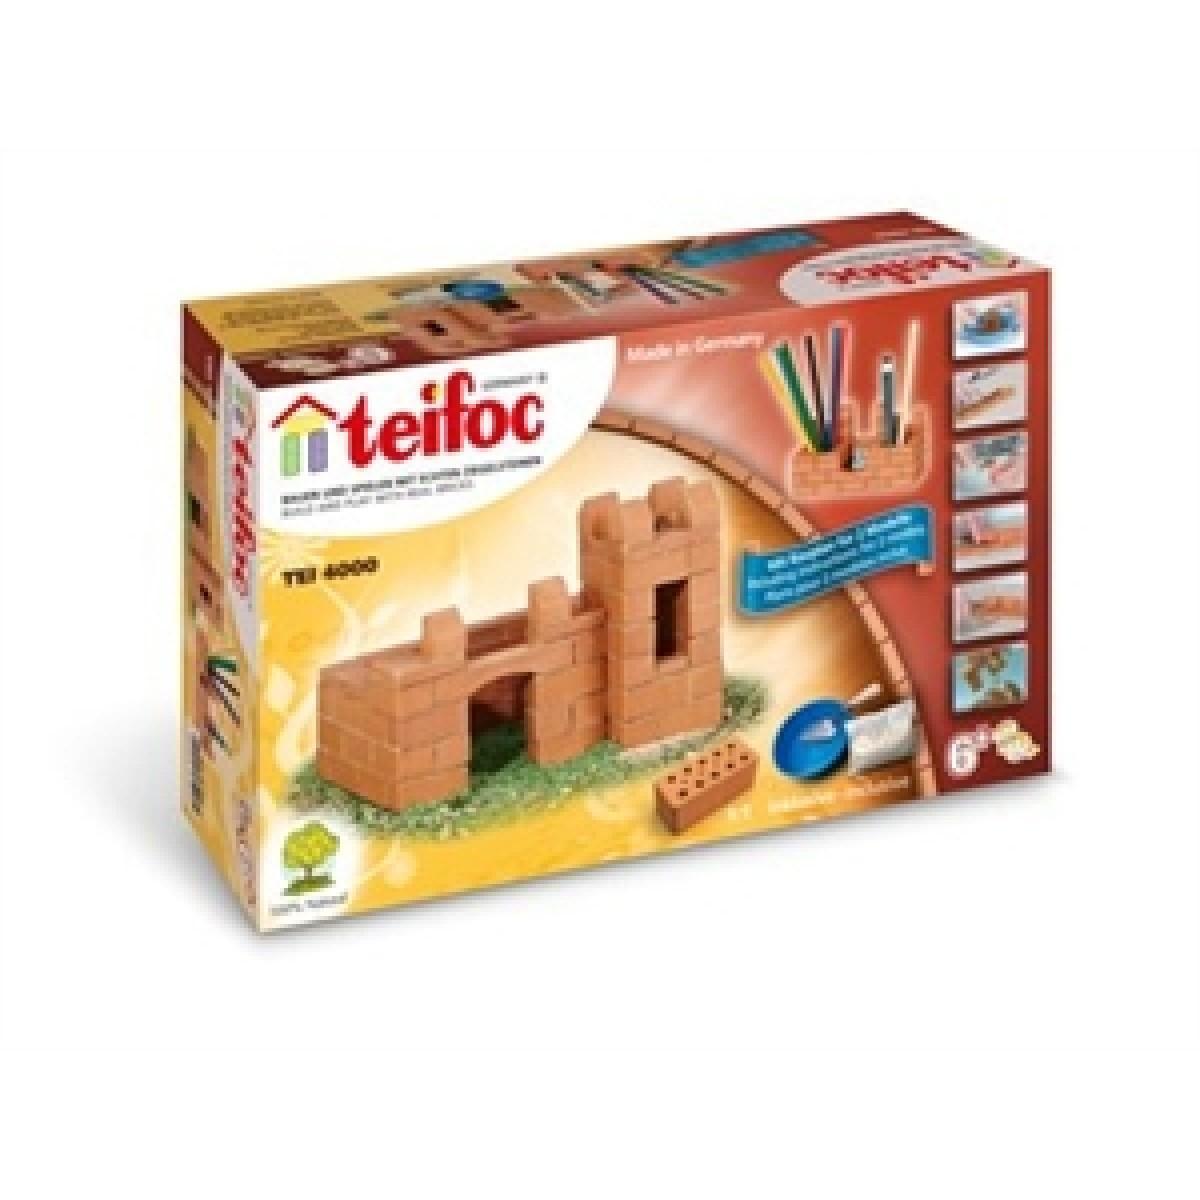 TEIFOC CASTELLO CON VARIAZIONI TEI 4000